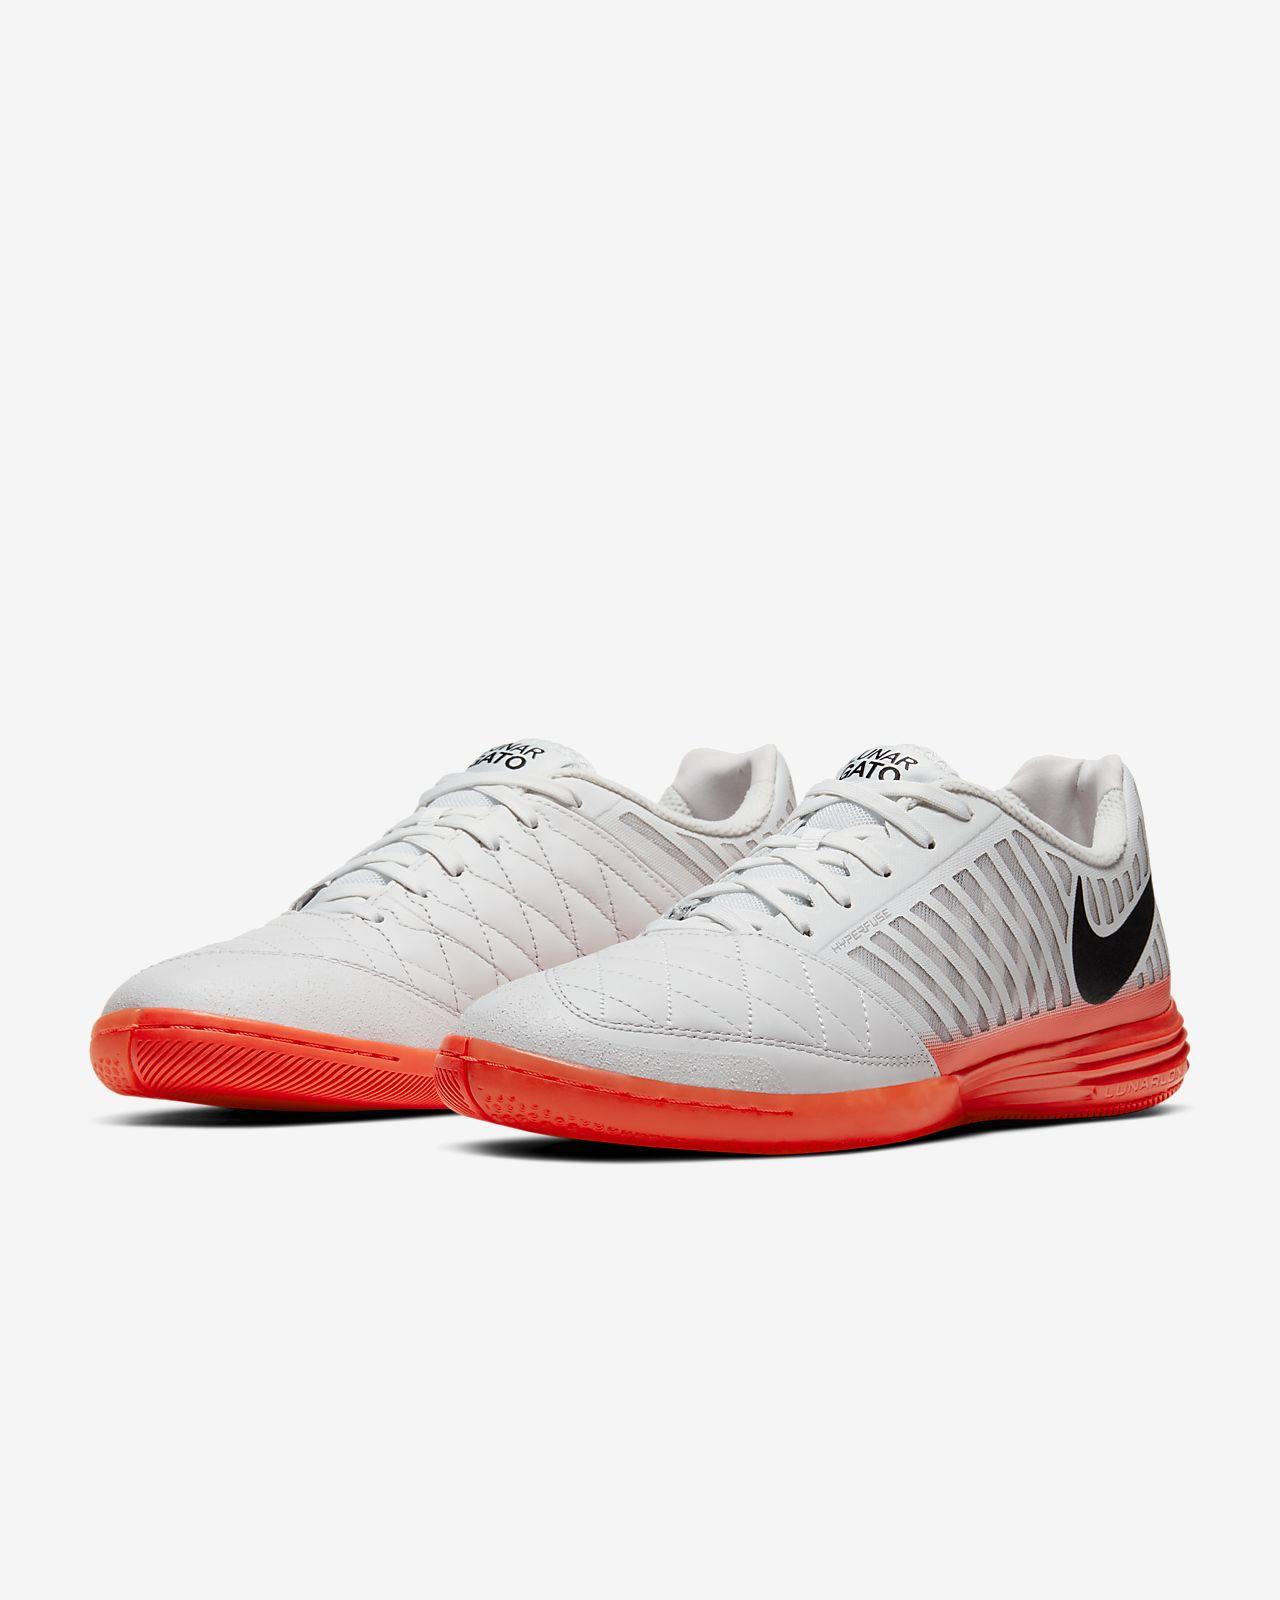 catch sleek release info on Nike Lunar Gato II IC Indoor Court Football Shoe. Nike LU